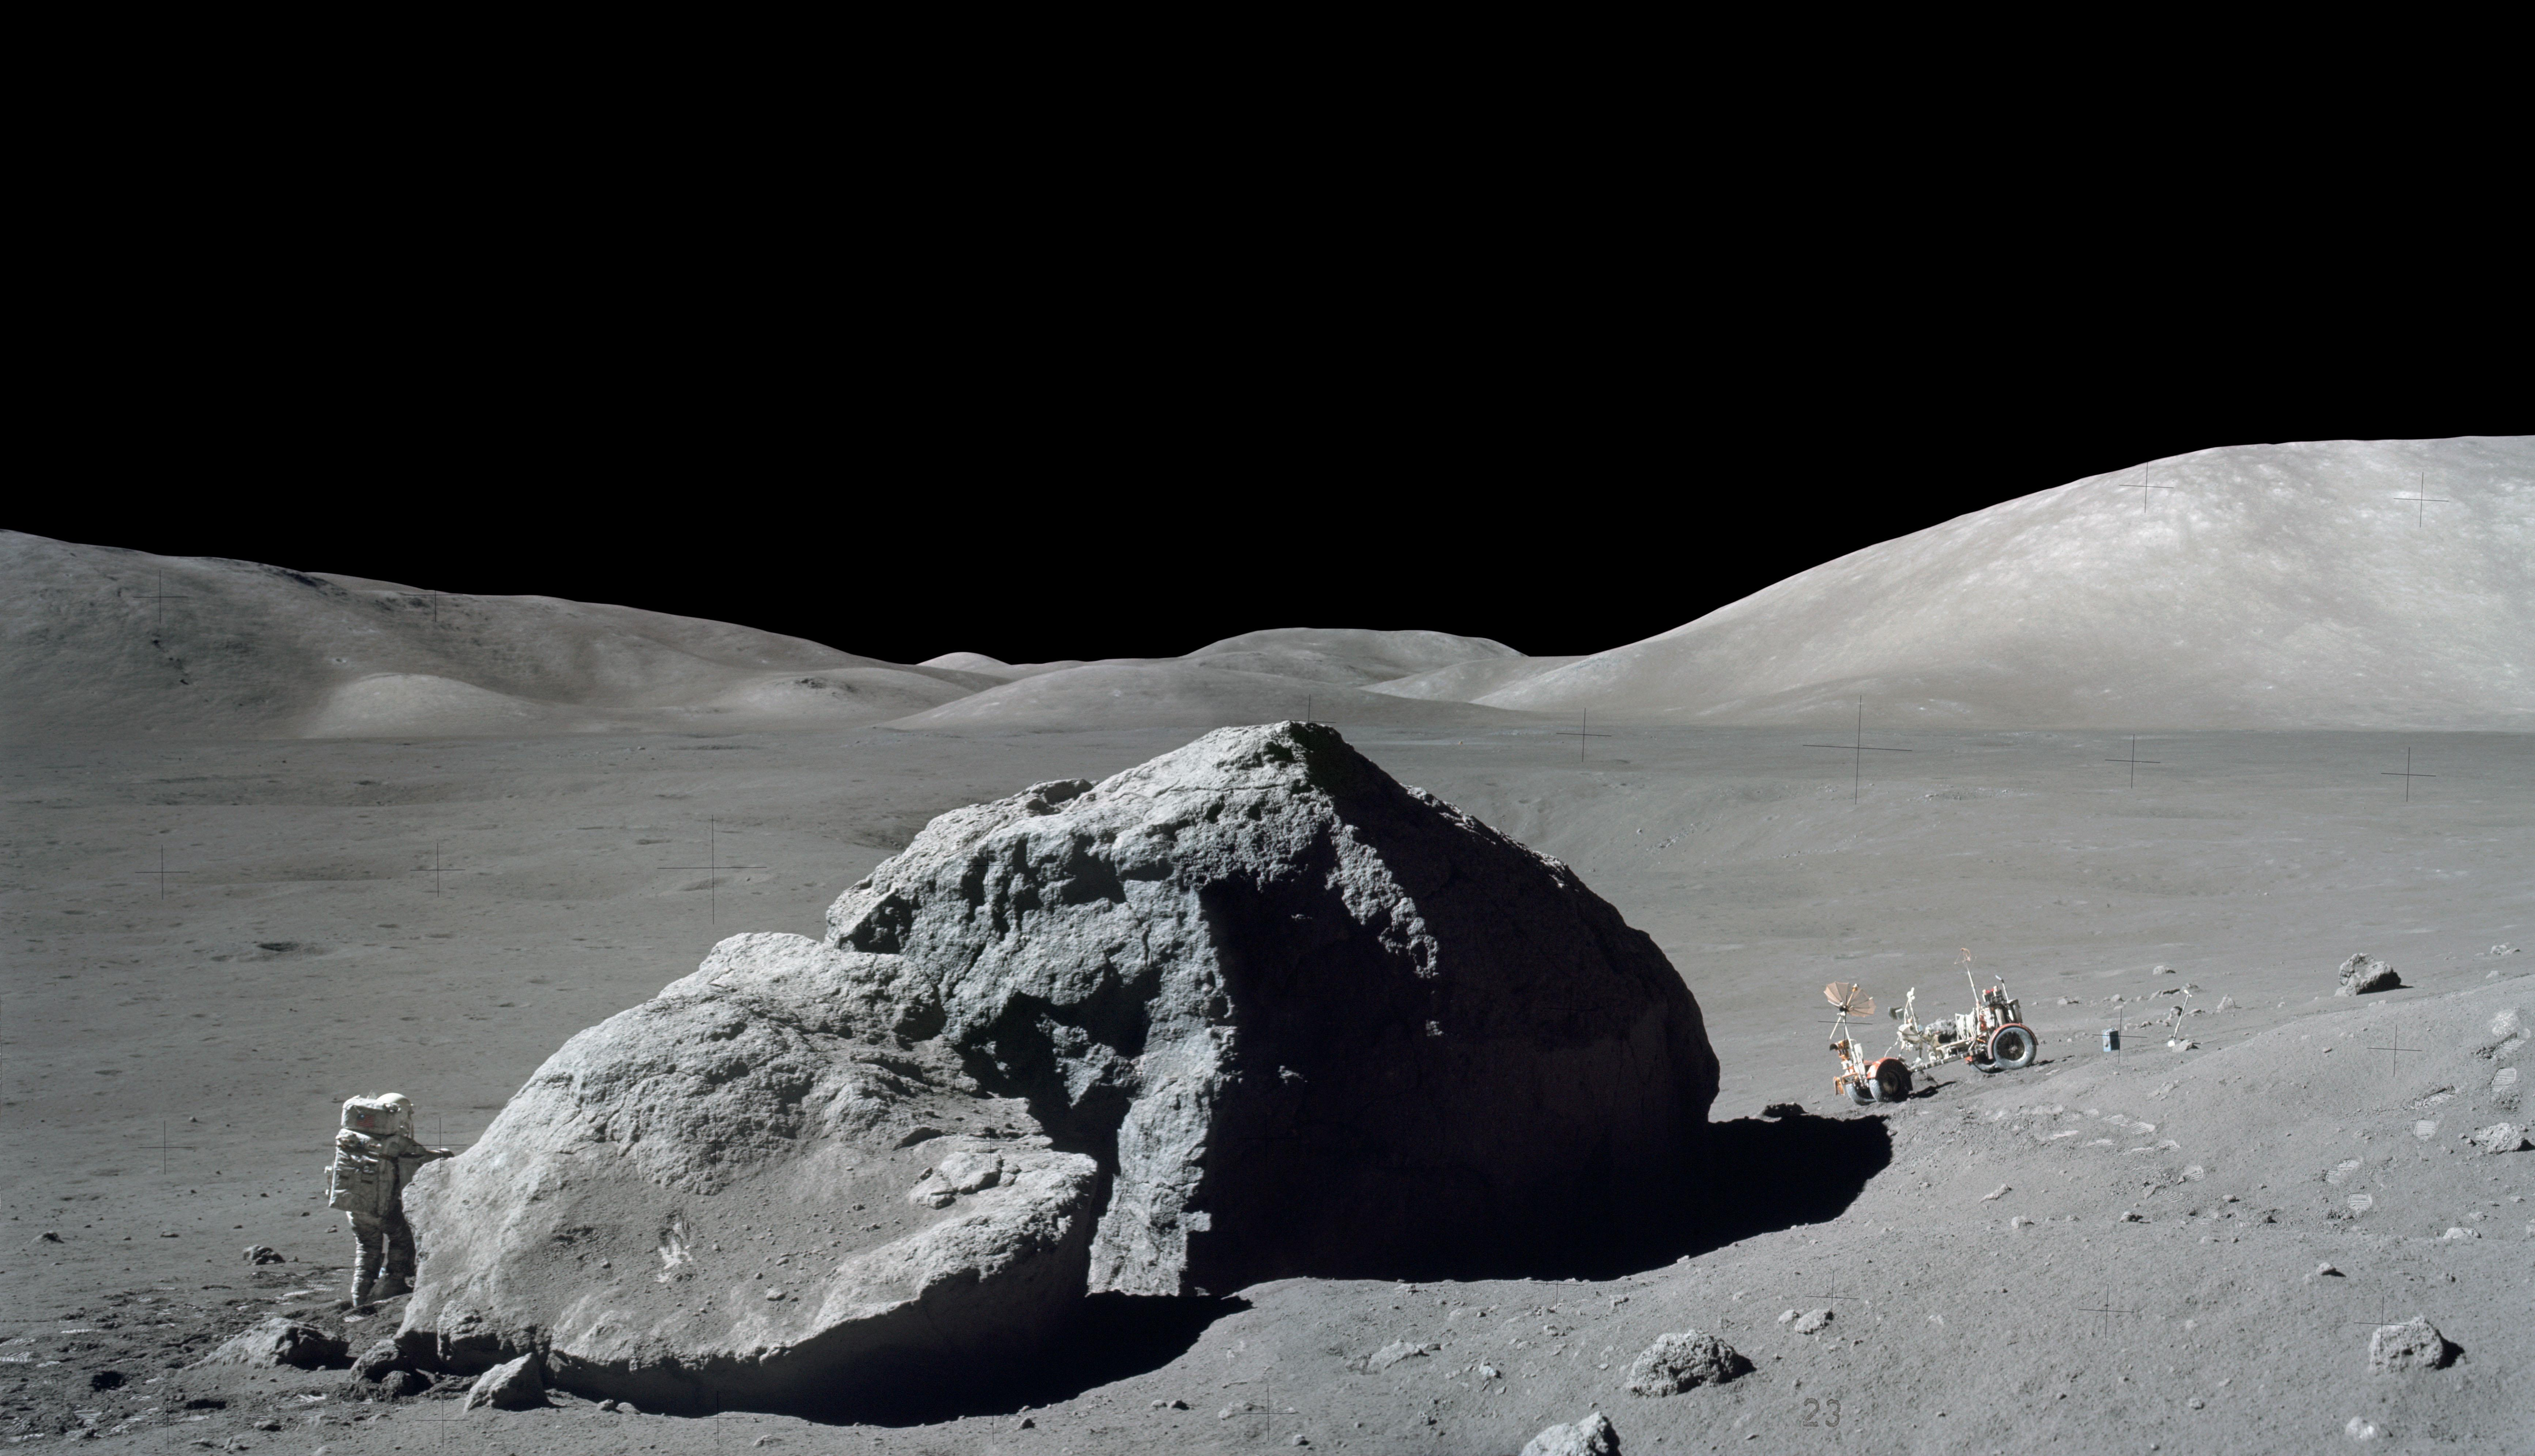 Apollo ll module clipart transparent background.